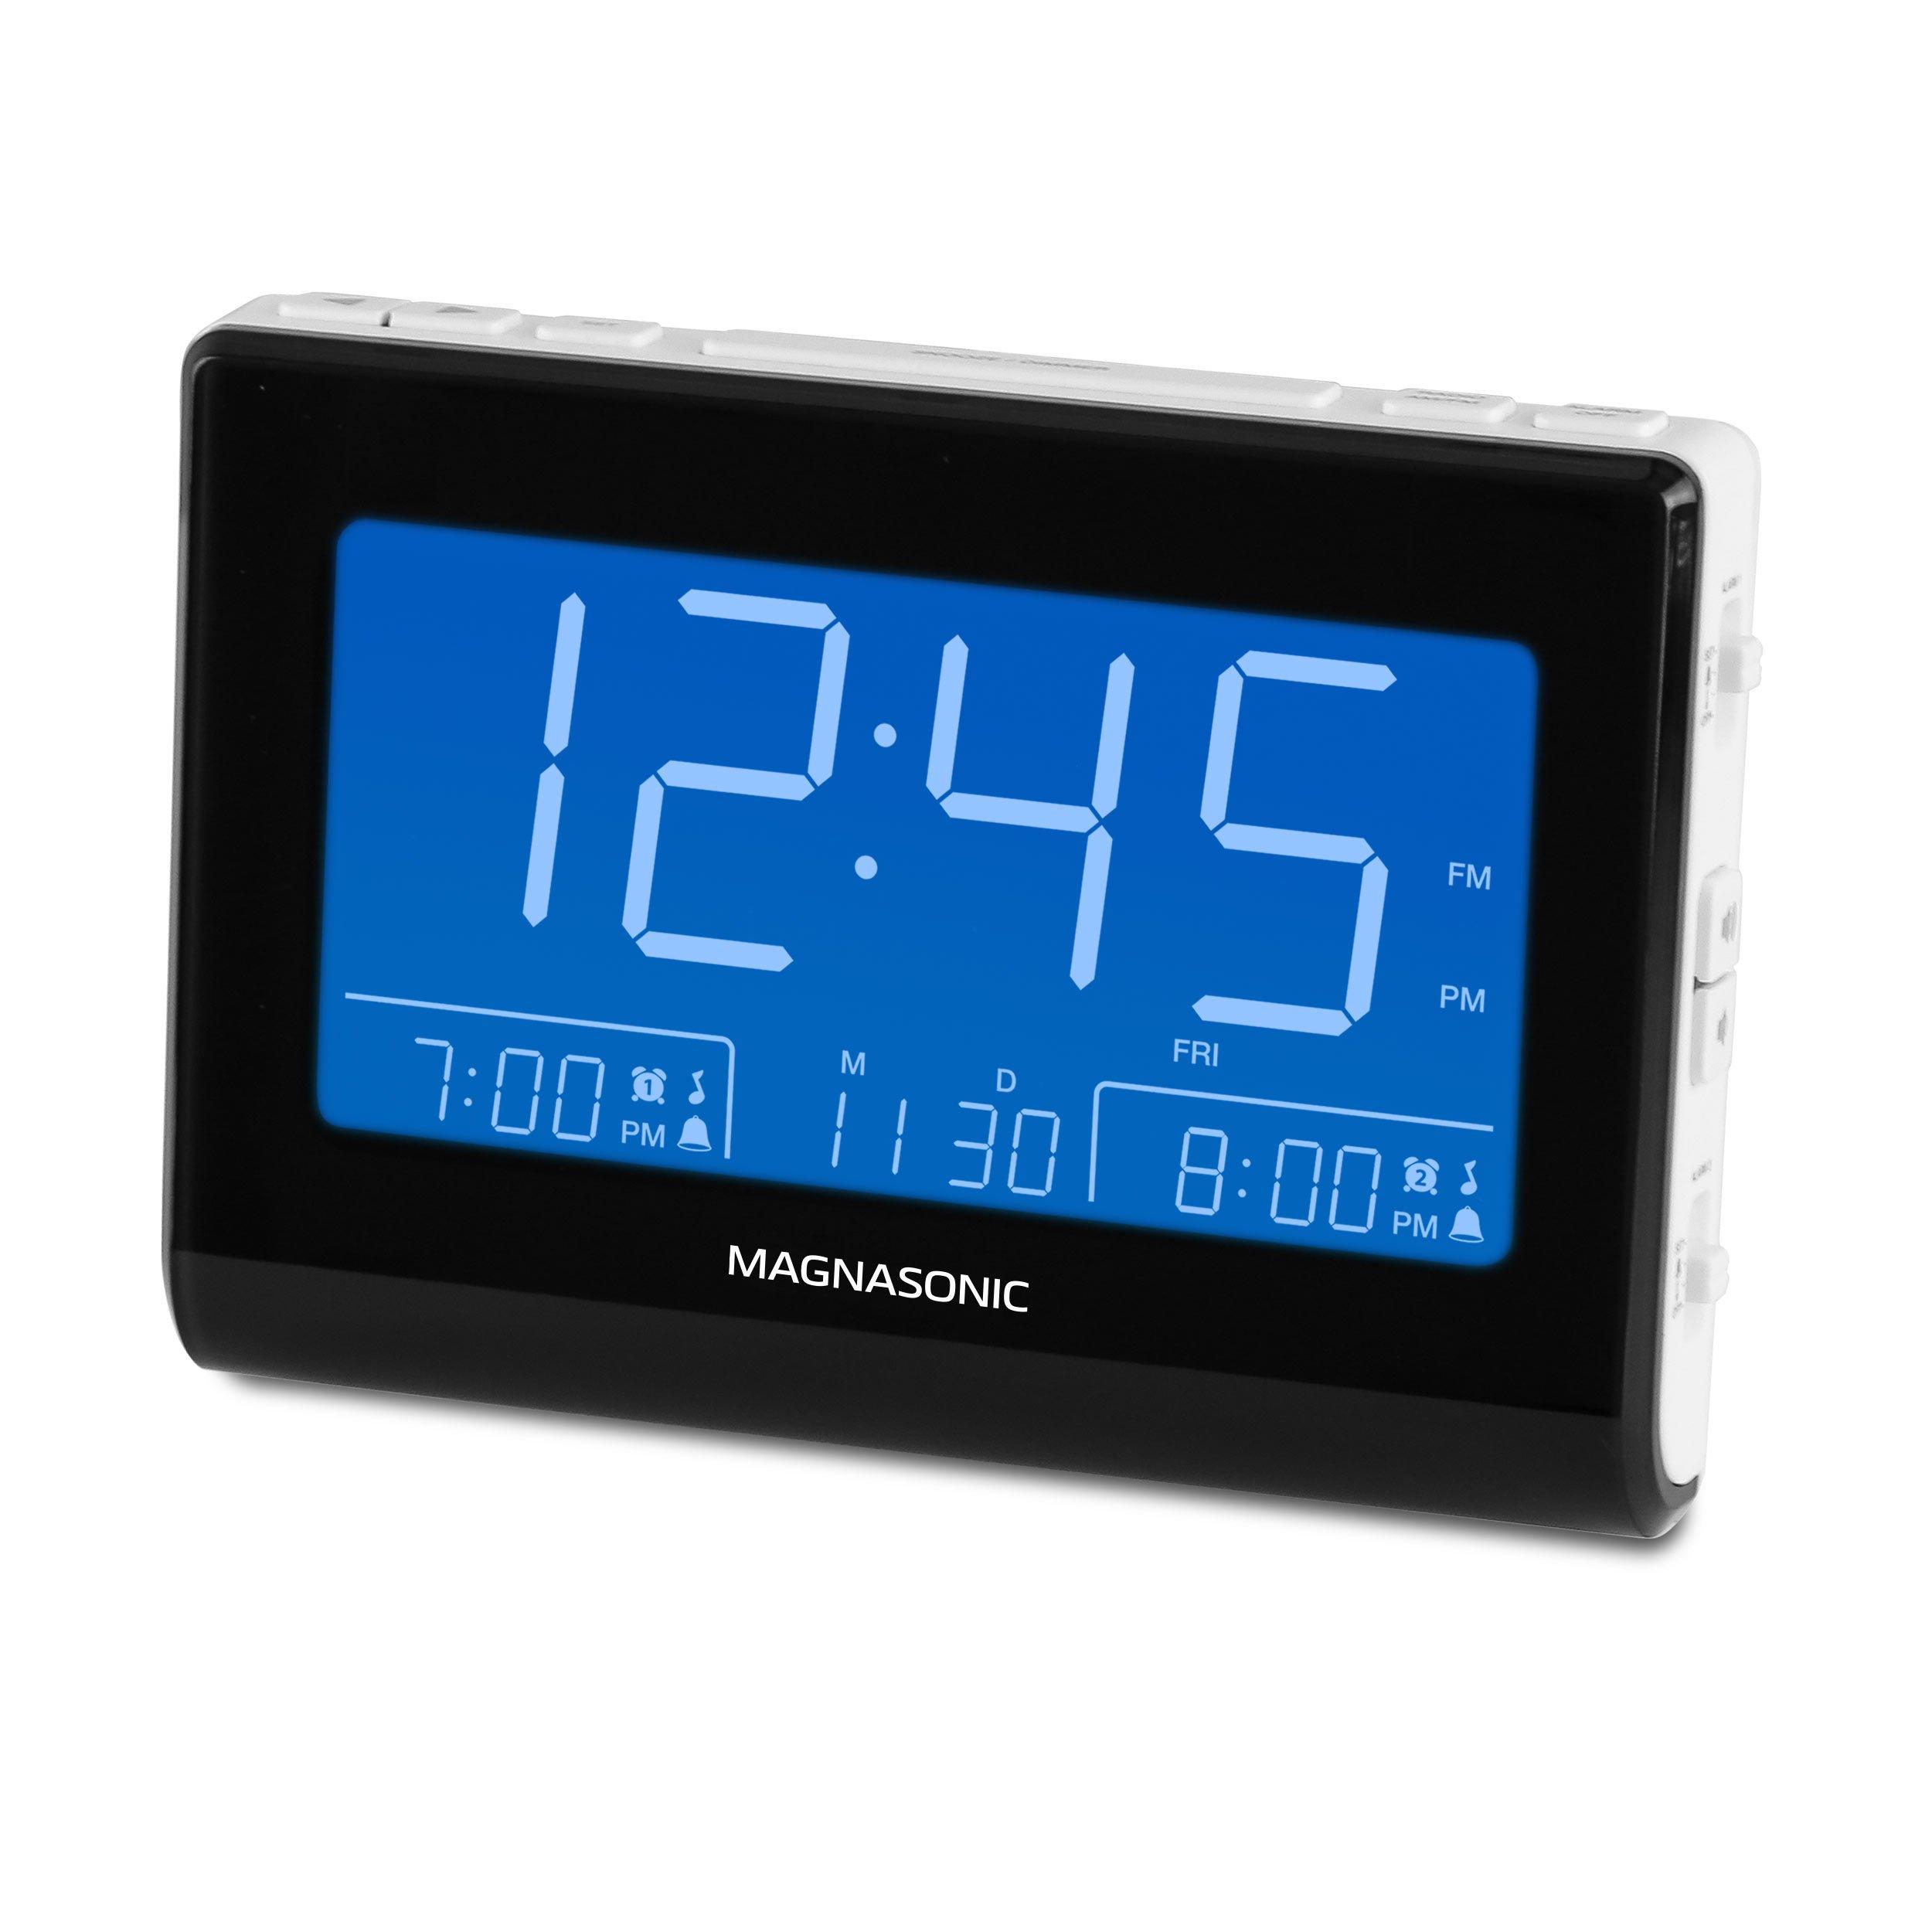 Magnasonic Alarm Clock Radio with USB Charging for Smartphones & Tablets, Auto Dimming, Dual Gradual Wake Alarm, Battery Backup, Auto Time Set, Large 4.8'' LED Display, AM/FM (CR63W)